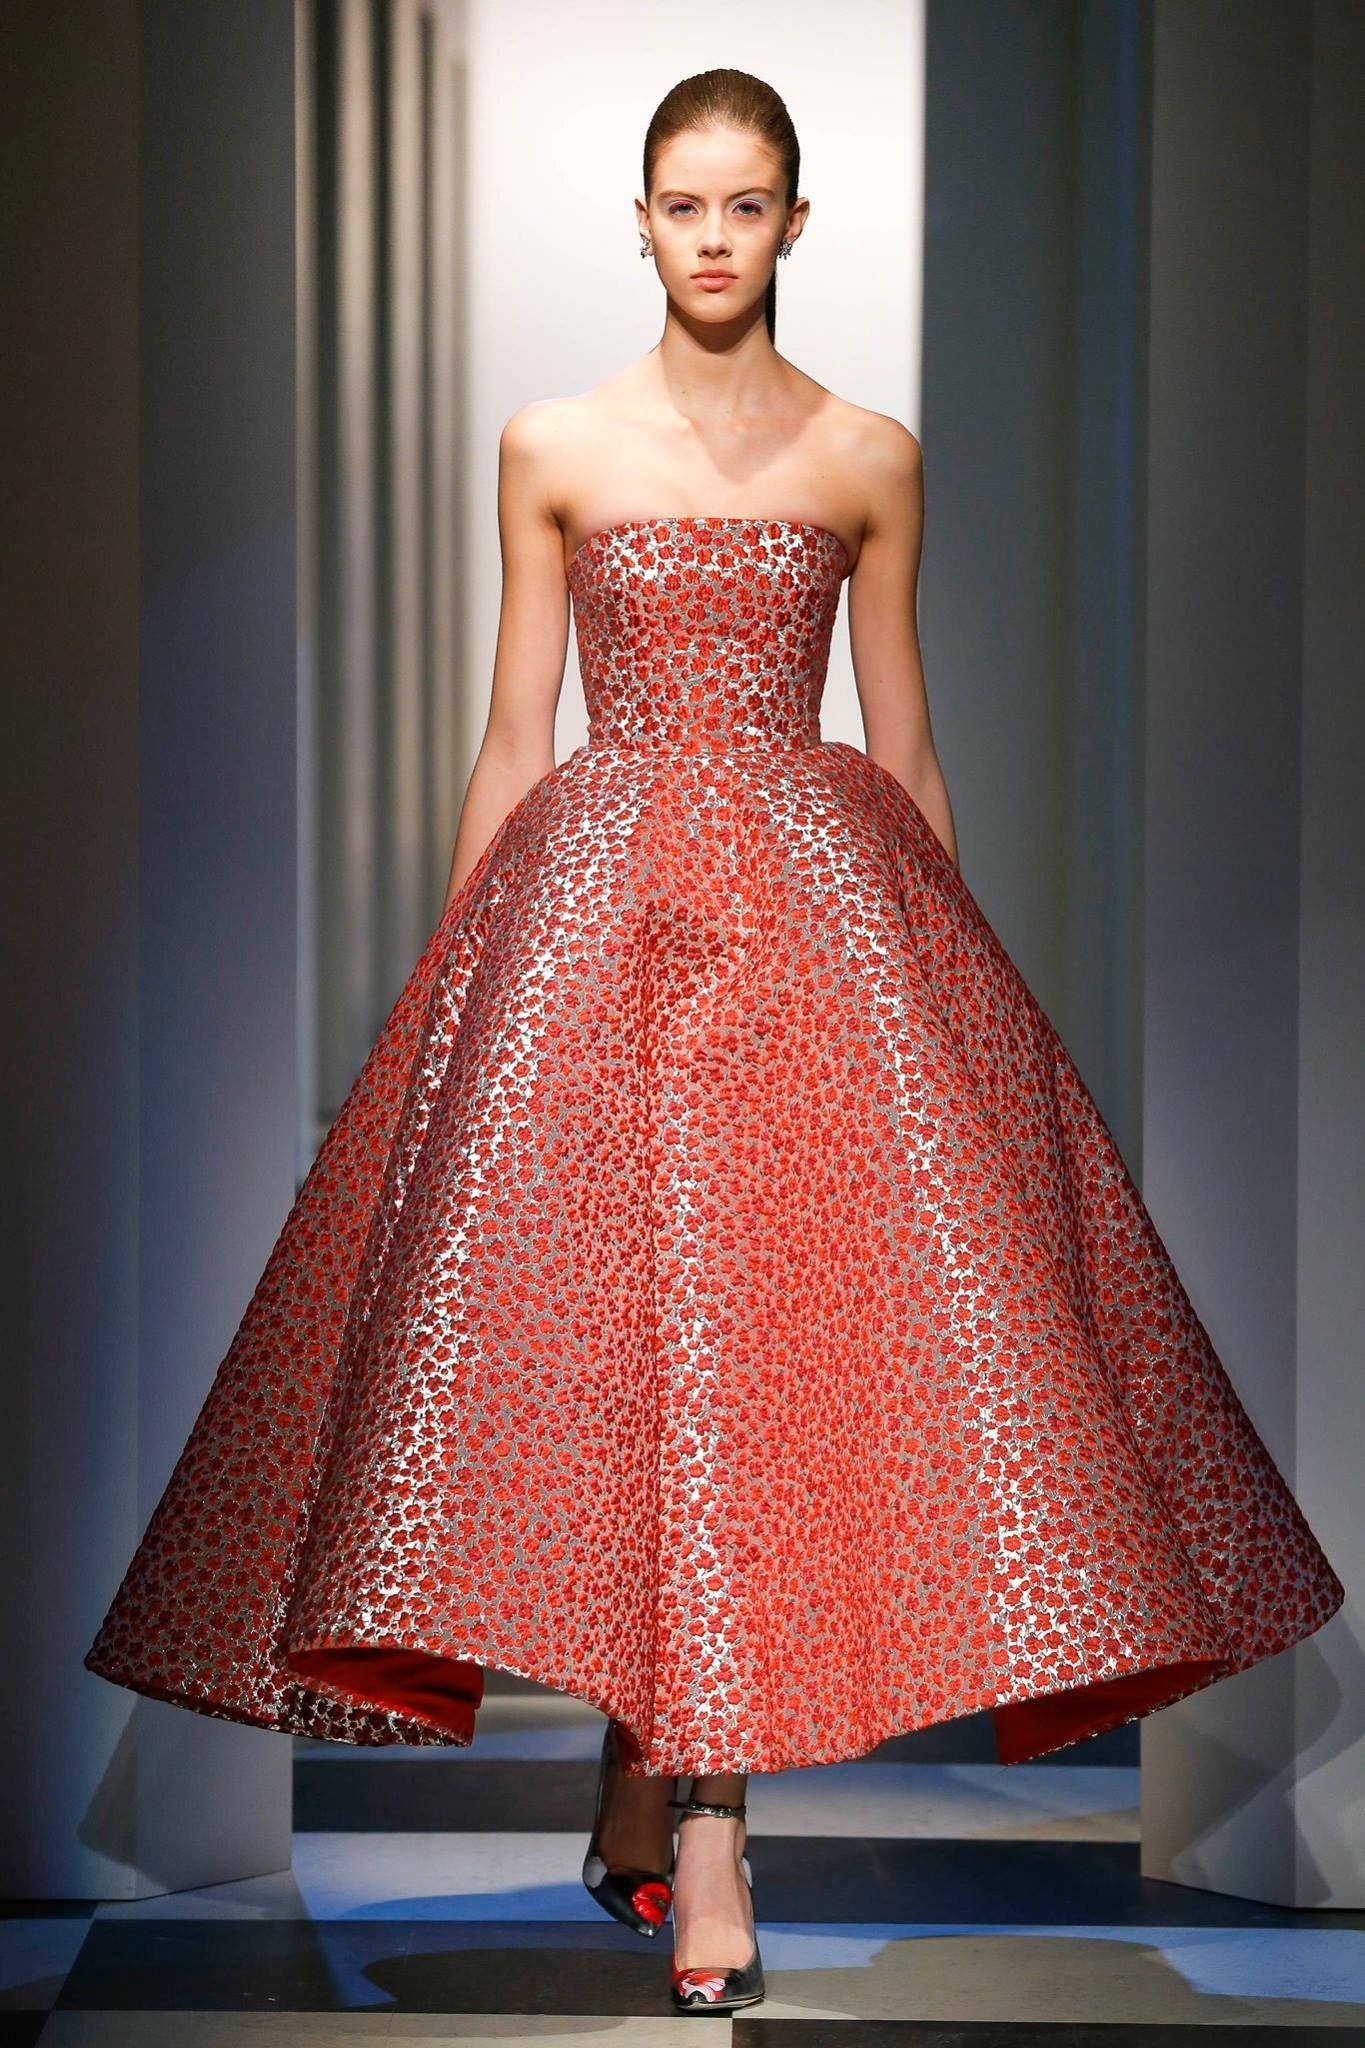 Classic beauty and style | Fashion | Pinterest | Oscar de la Renta ...